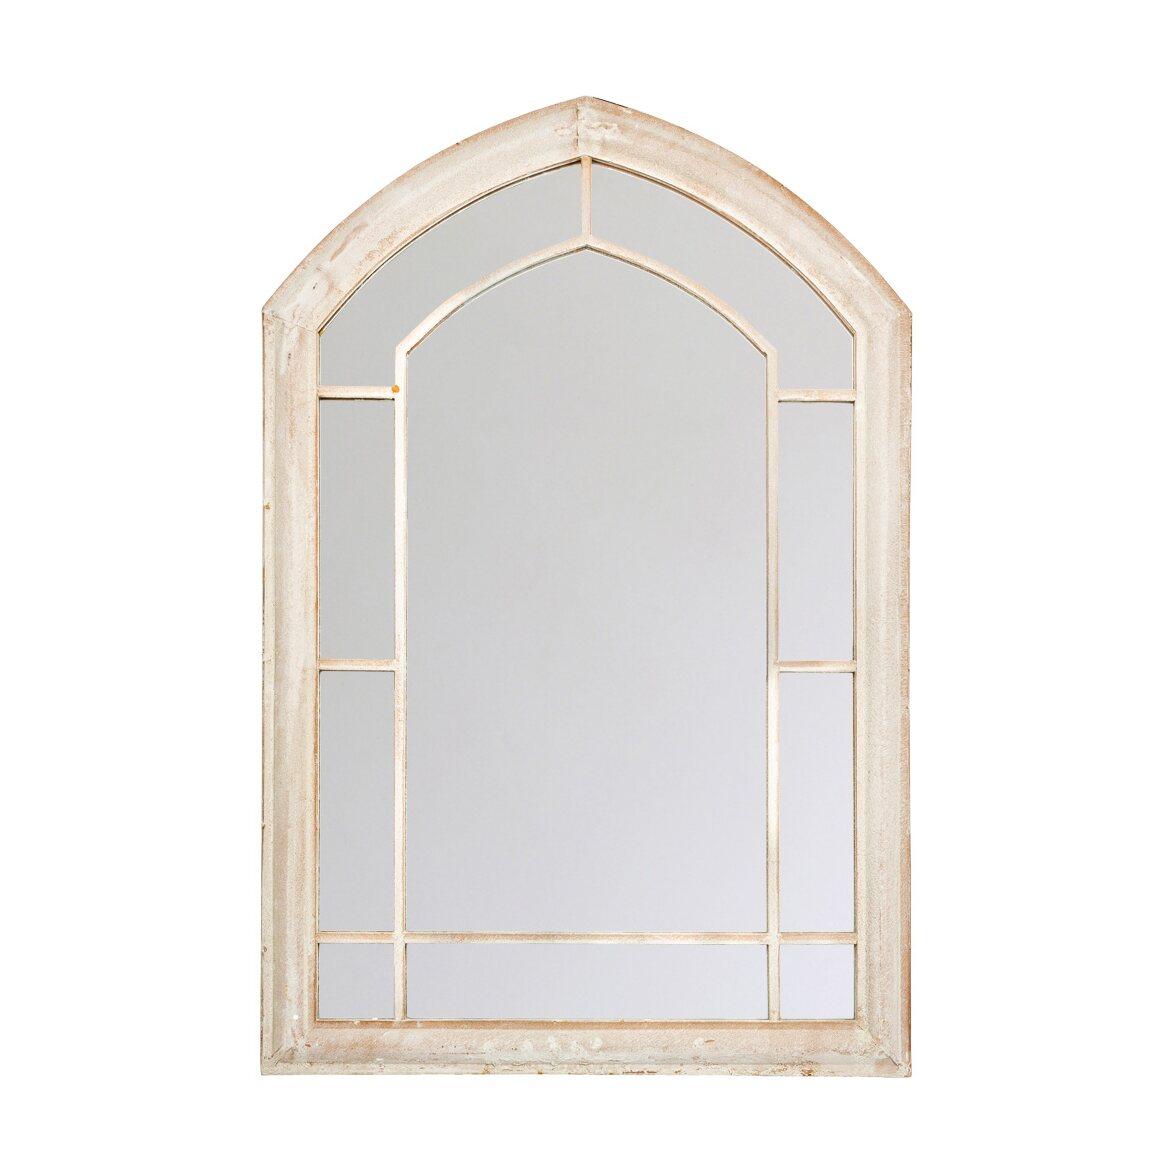 Настенное зеркало «Шинон»   Настенные зеркала Kingsby